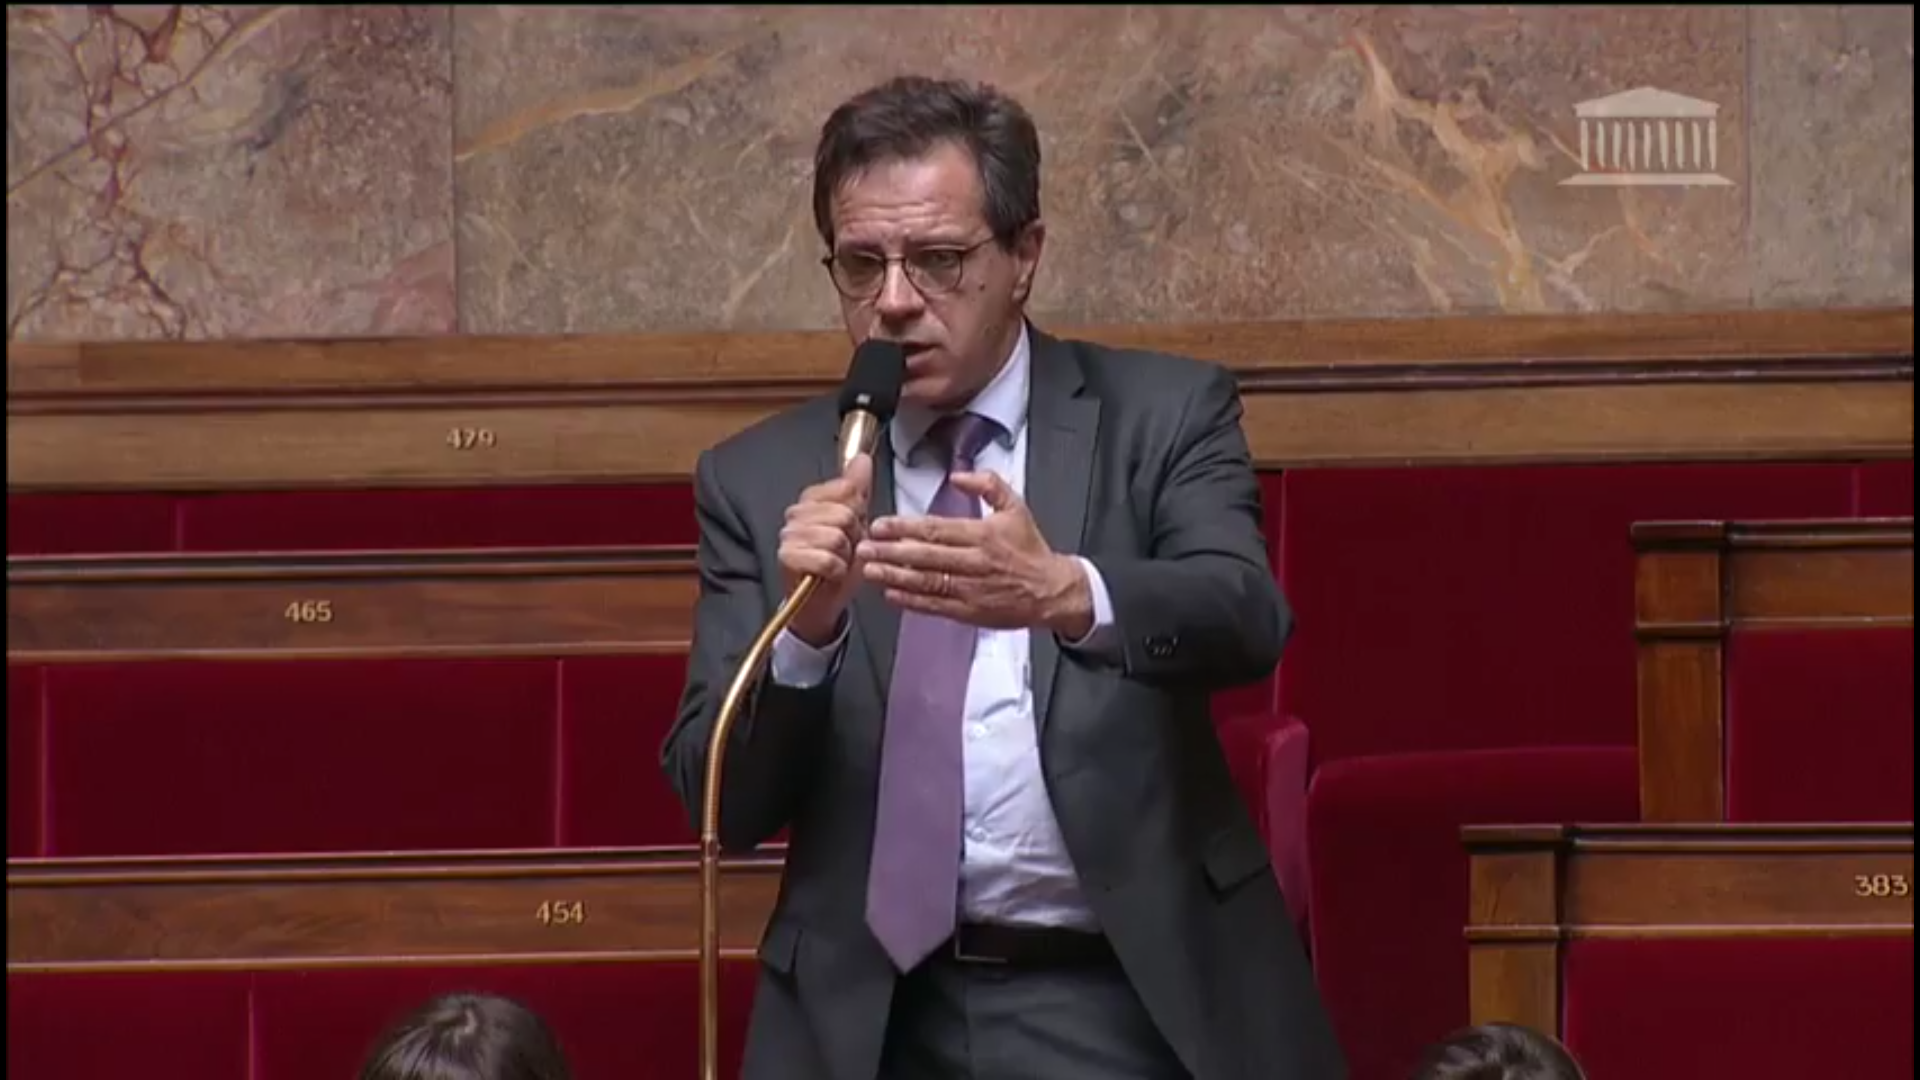 Frédéric Descrozaille